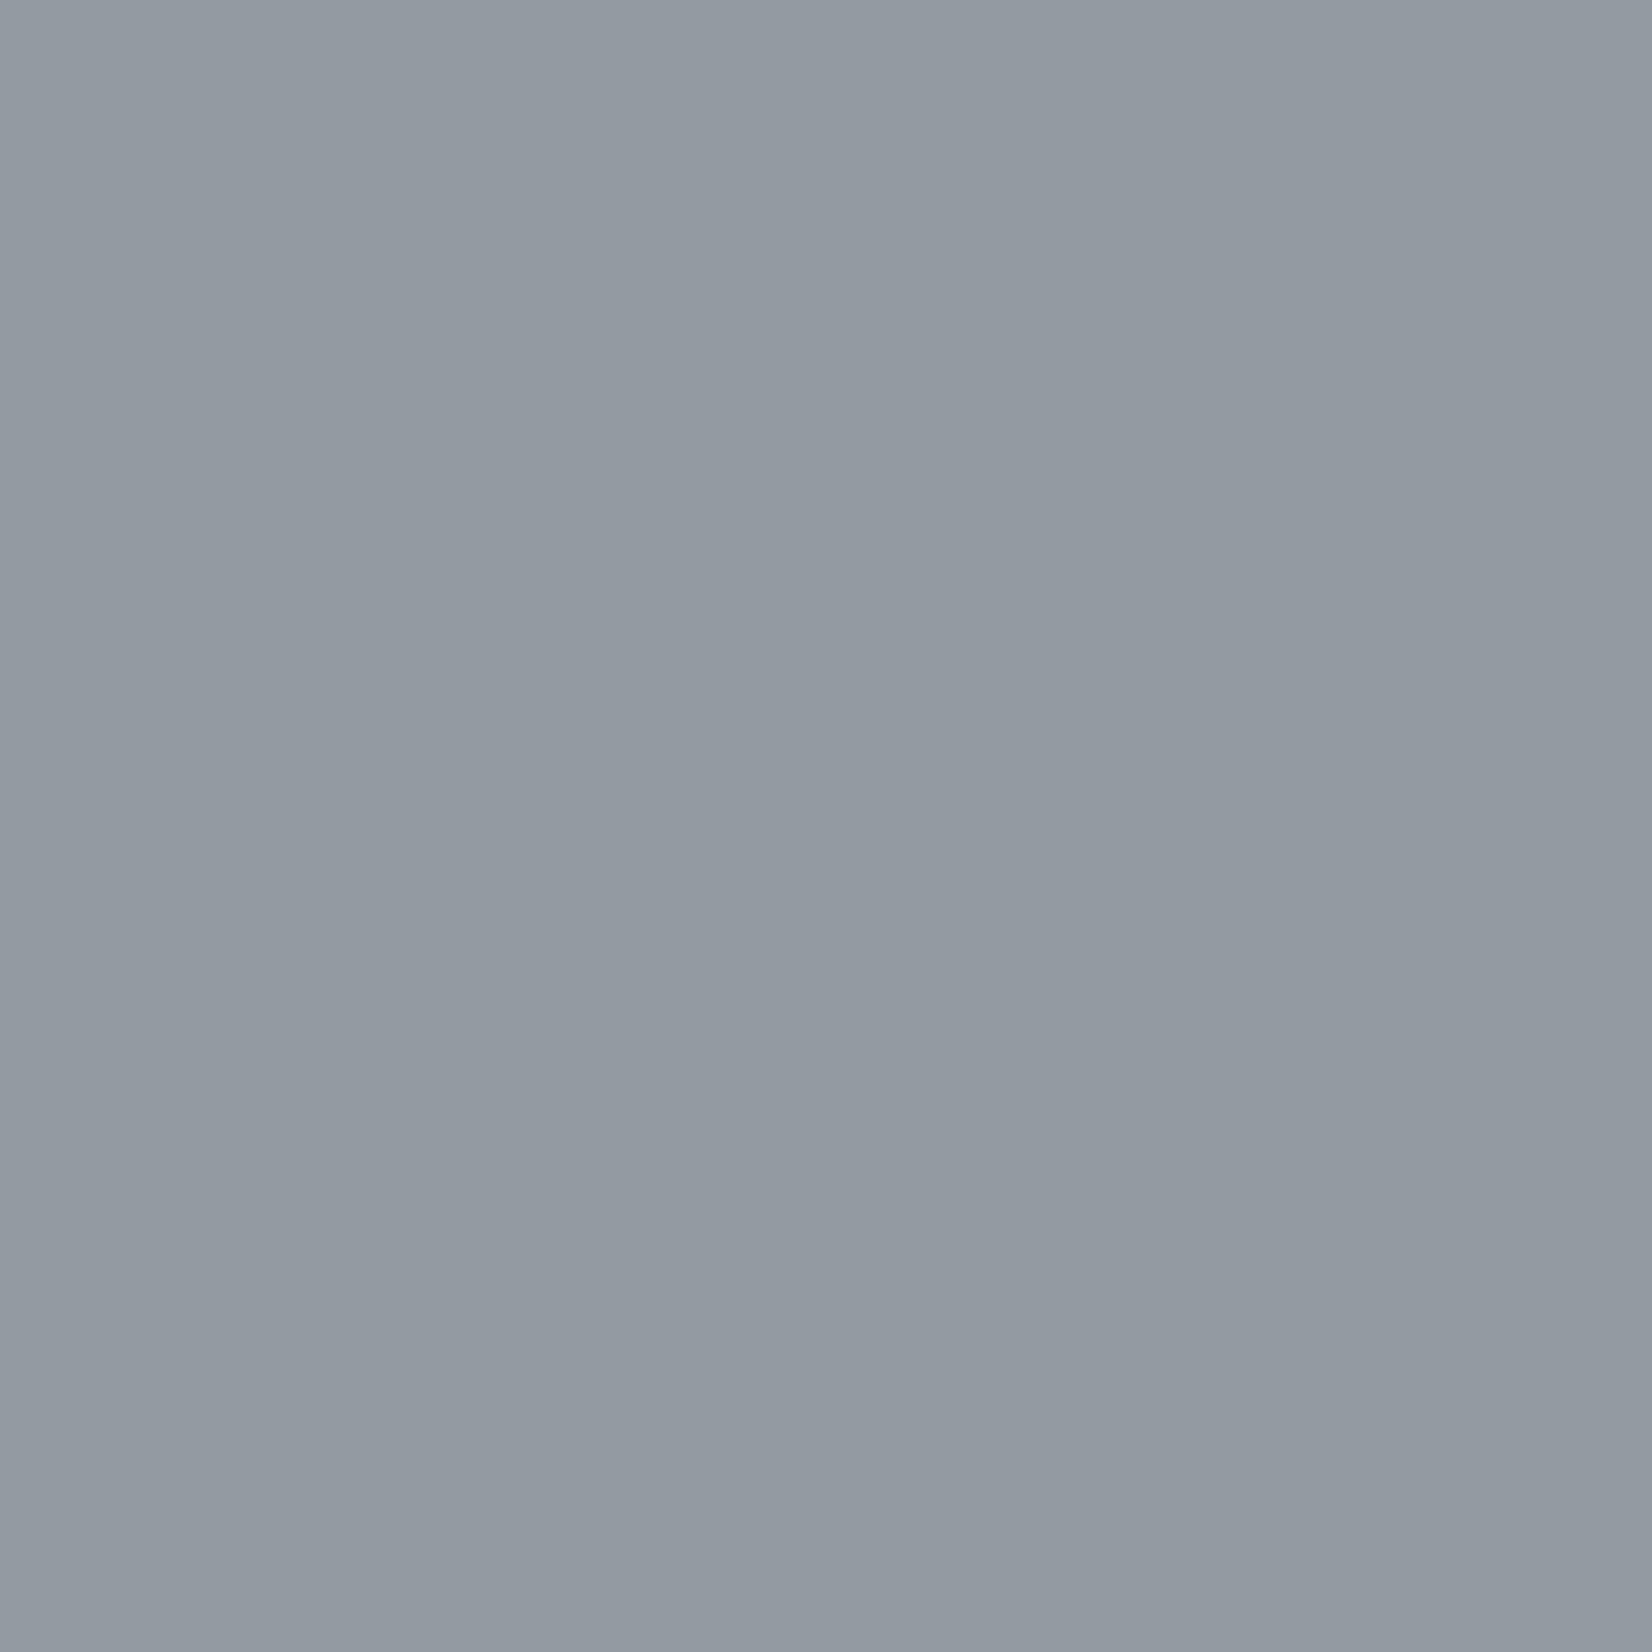 "Savage Savage Widetone Seamless Background Paper (#56 Fashion Gray, 107"" x 36')"